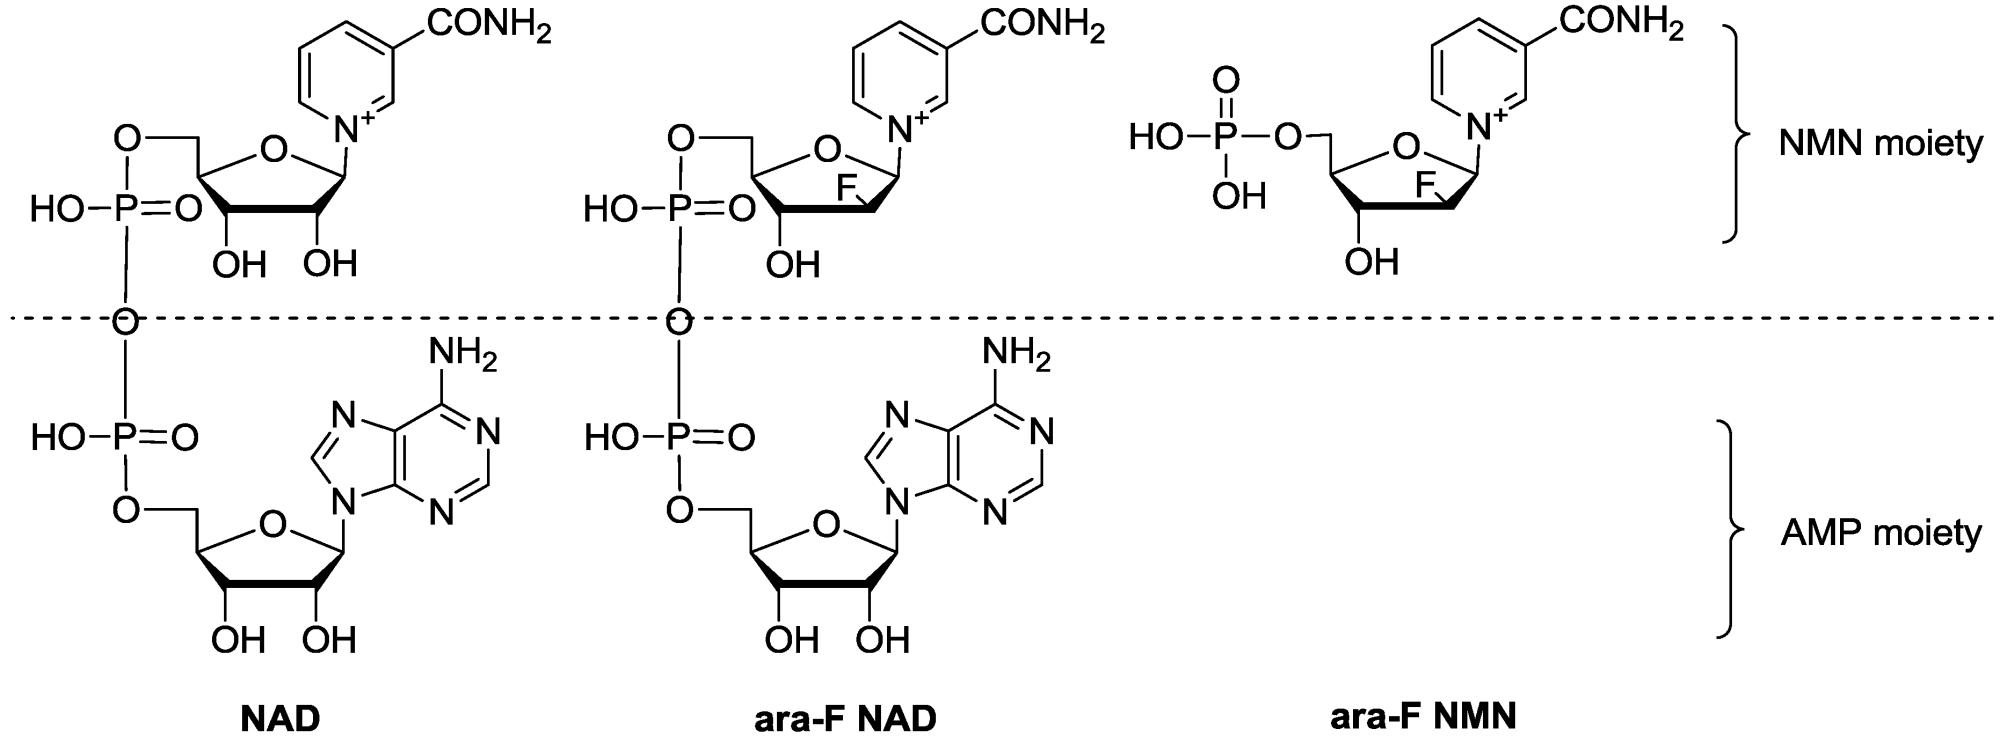 hight resolution of molecules 19 15754 g001